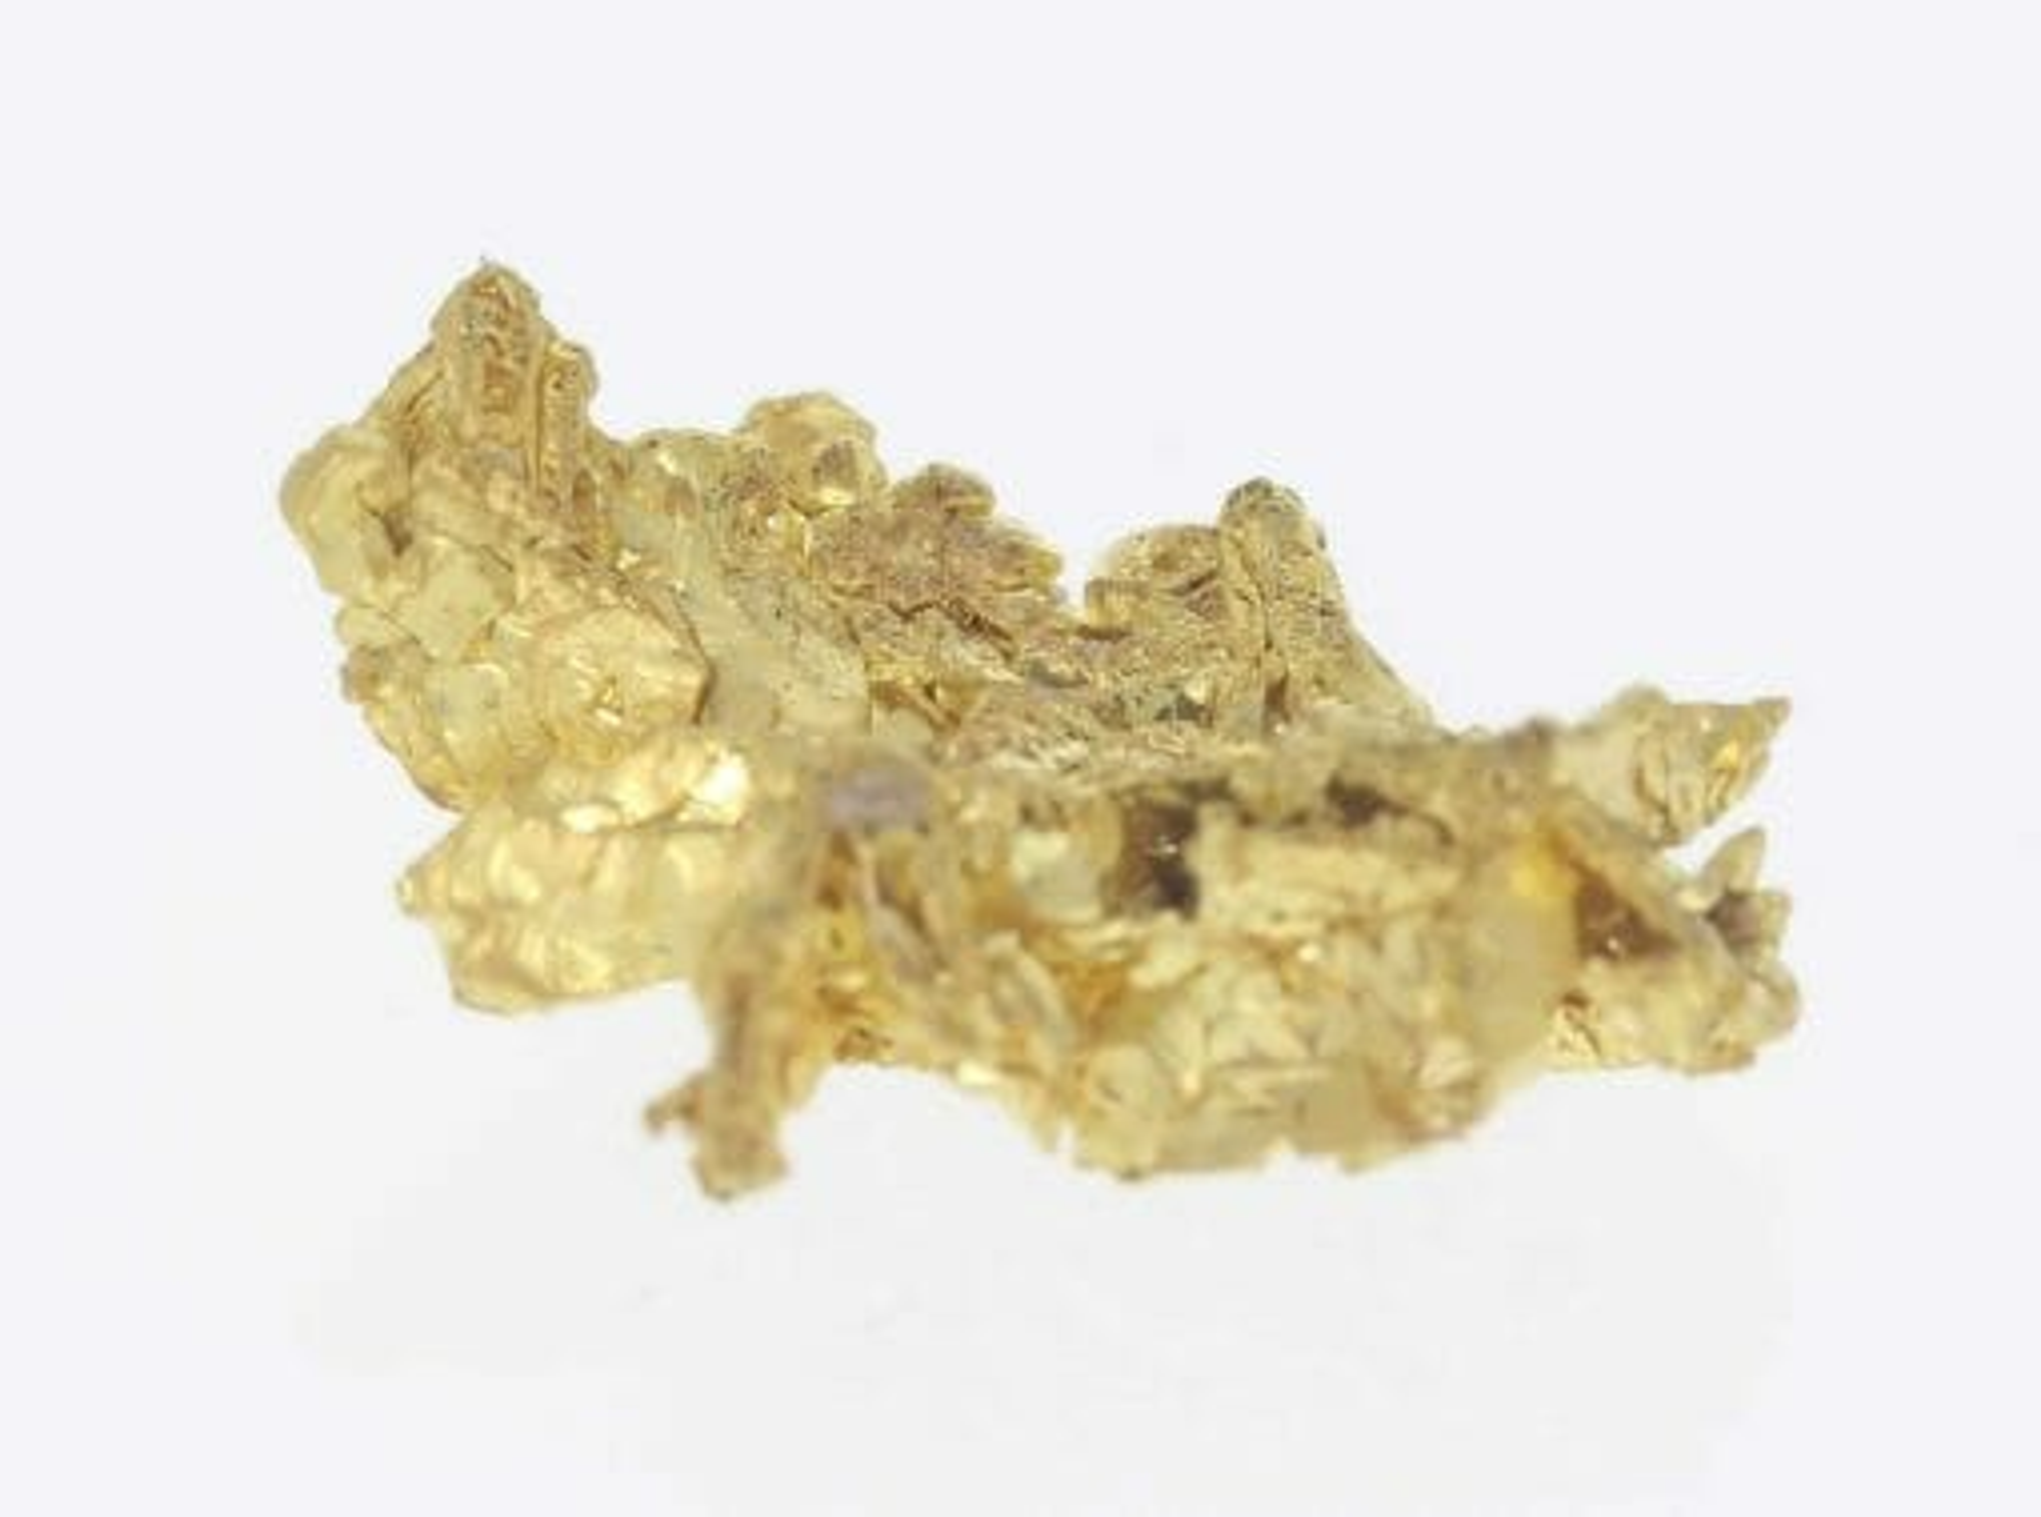 Natural Western Australian Gold Nugget - Crystalline Gold - 3.33g 4